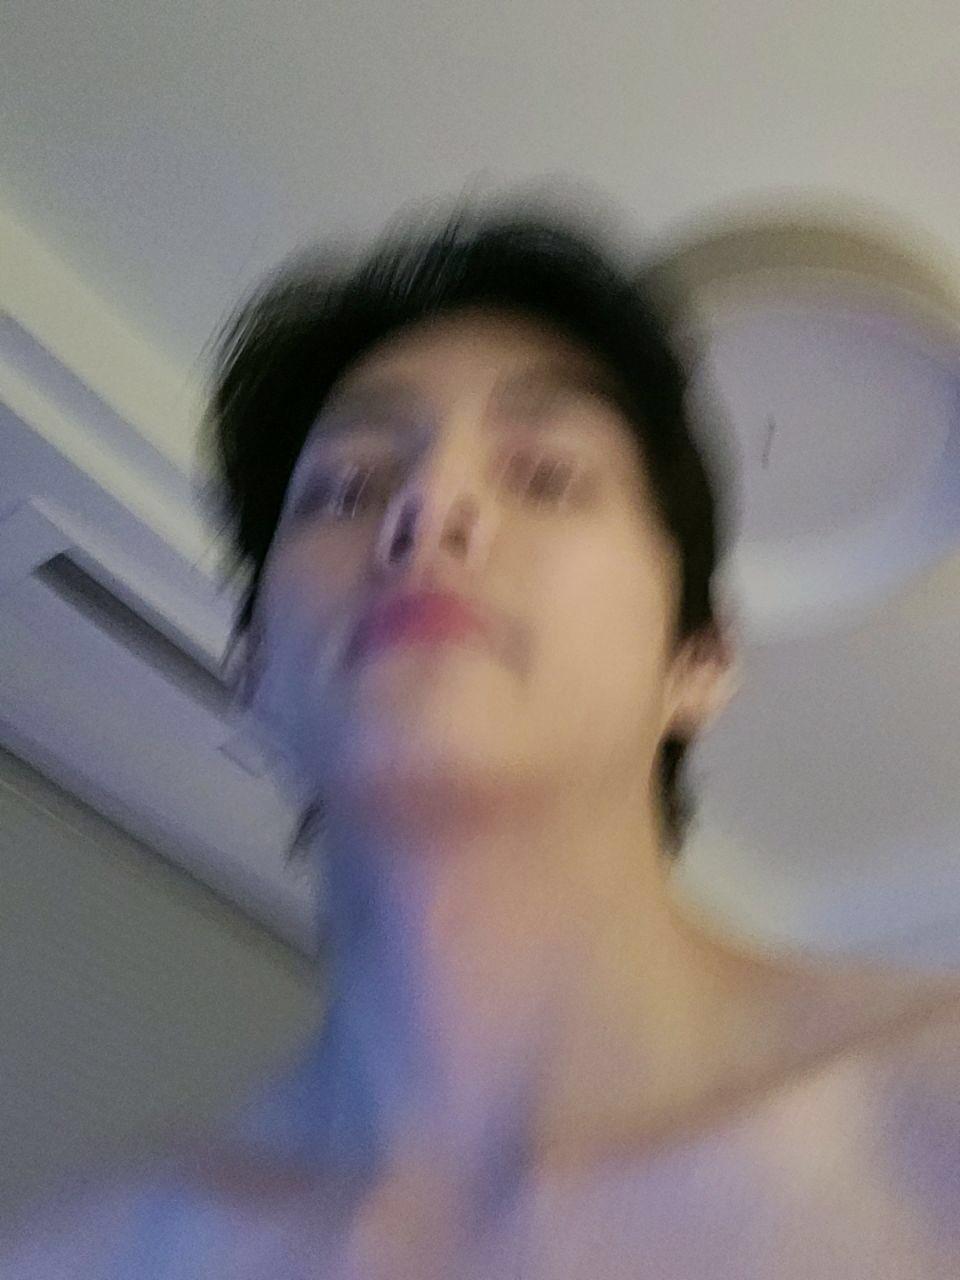 bts v shirtless 1